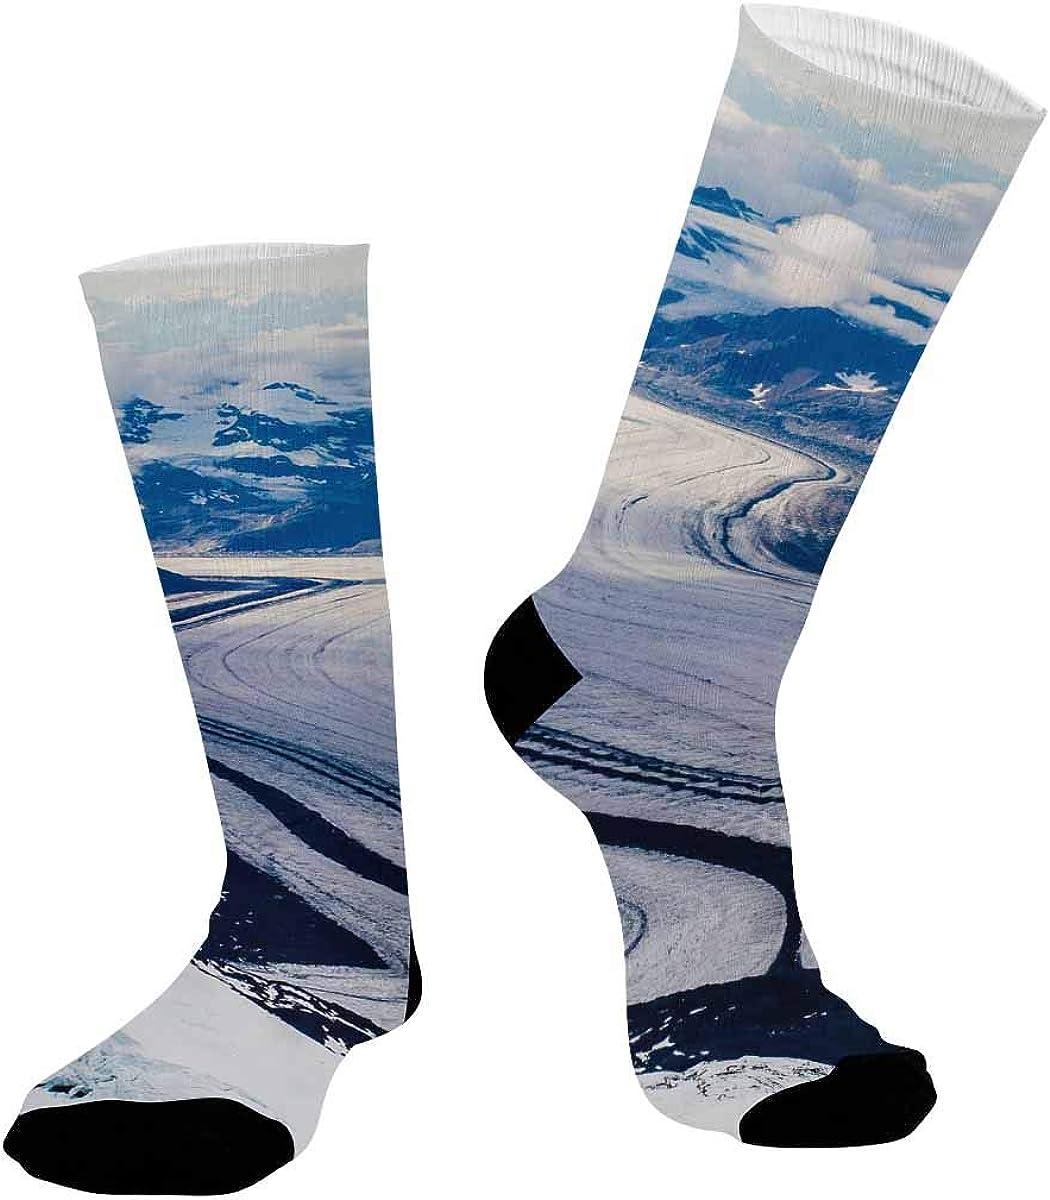 INTERESTPRINT Unisex Sublimated Athletic Crew Performance Socks Ice River, Ice Mountain